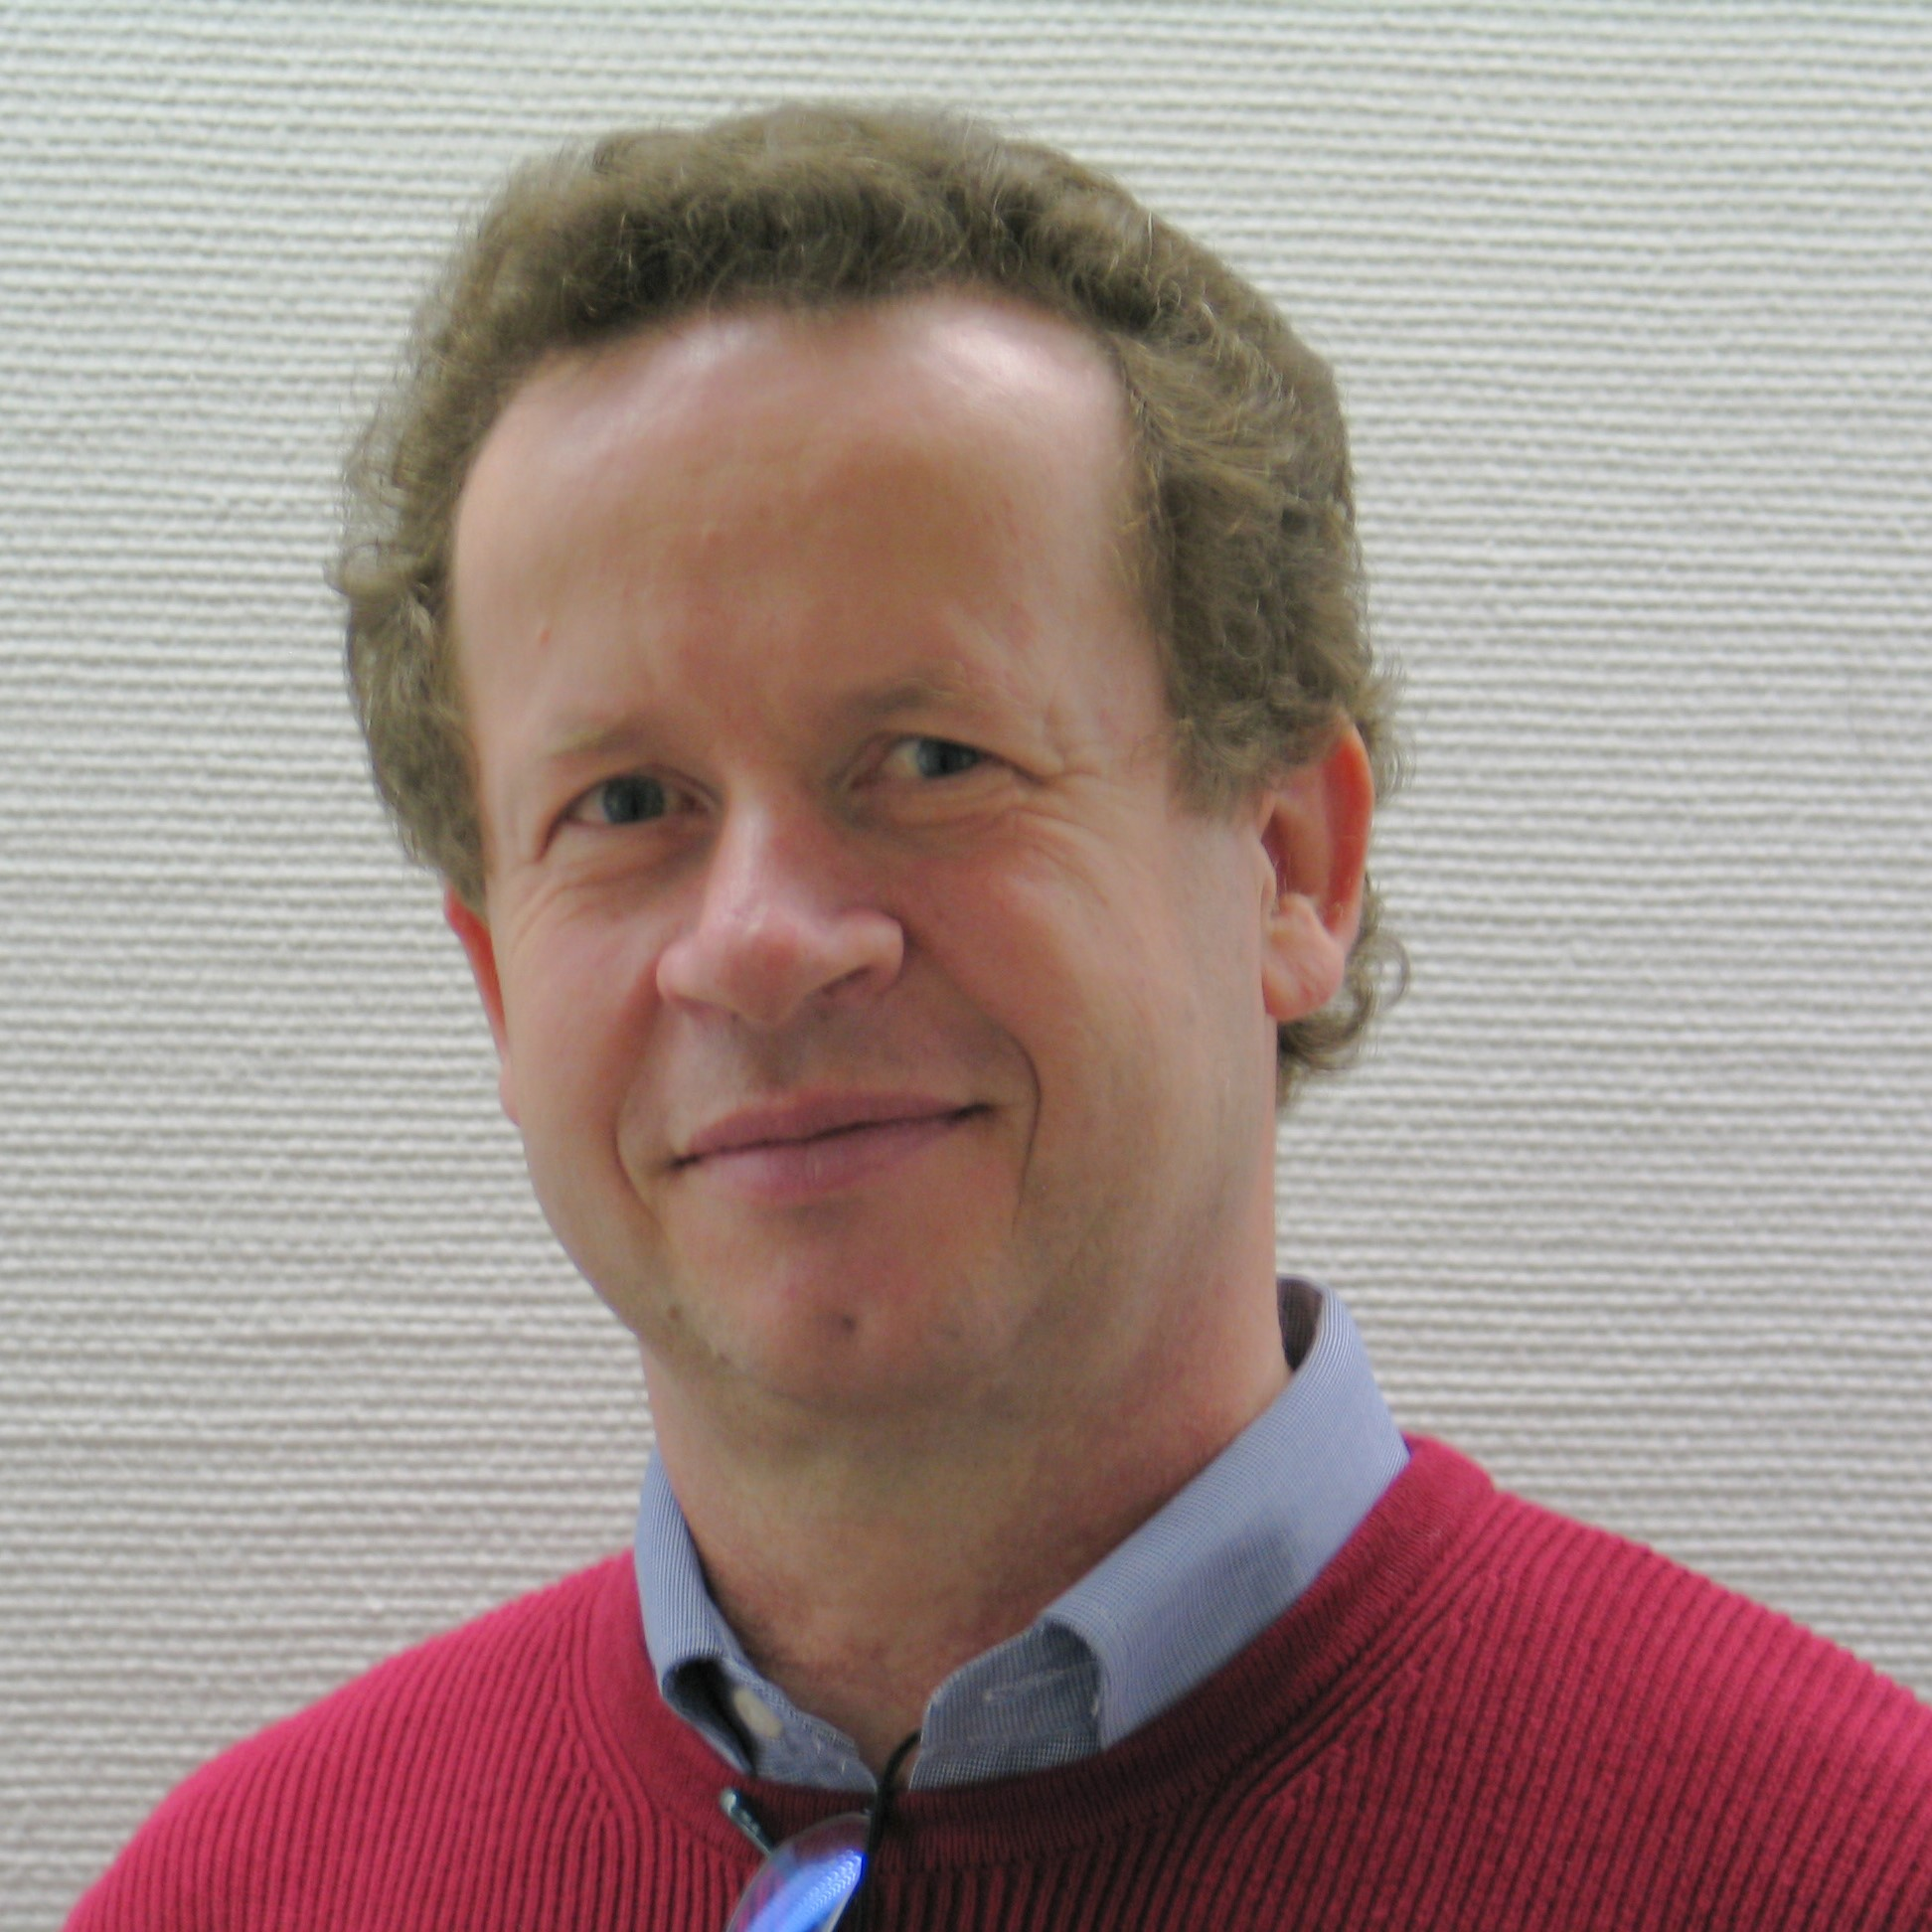 Dr. Heinz-Gerd Röhling